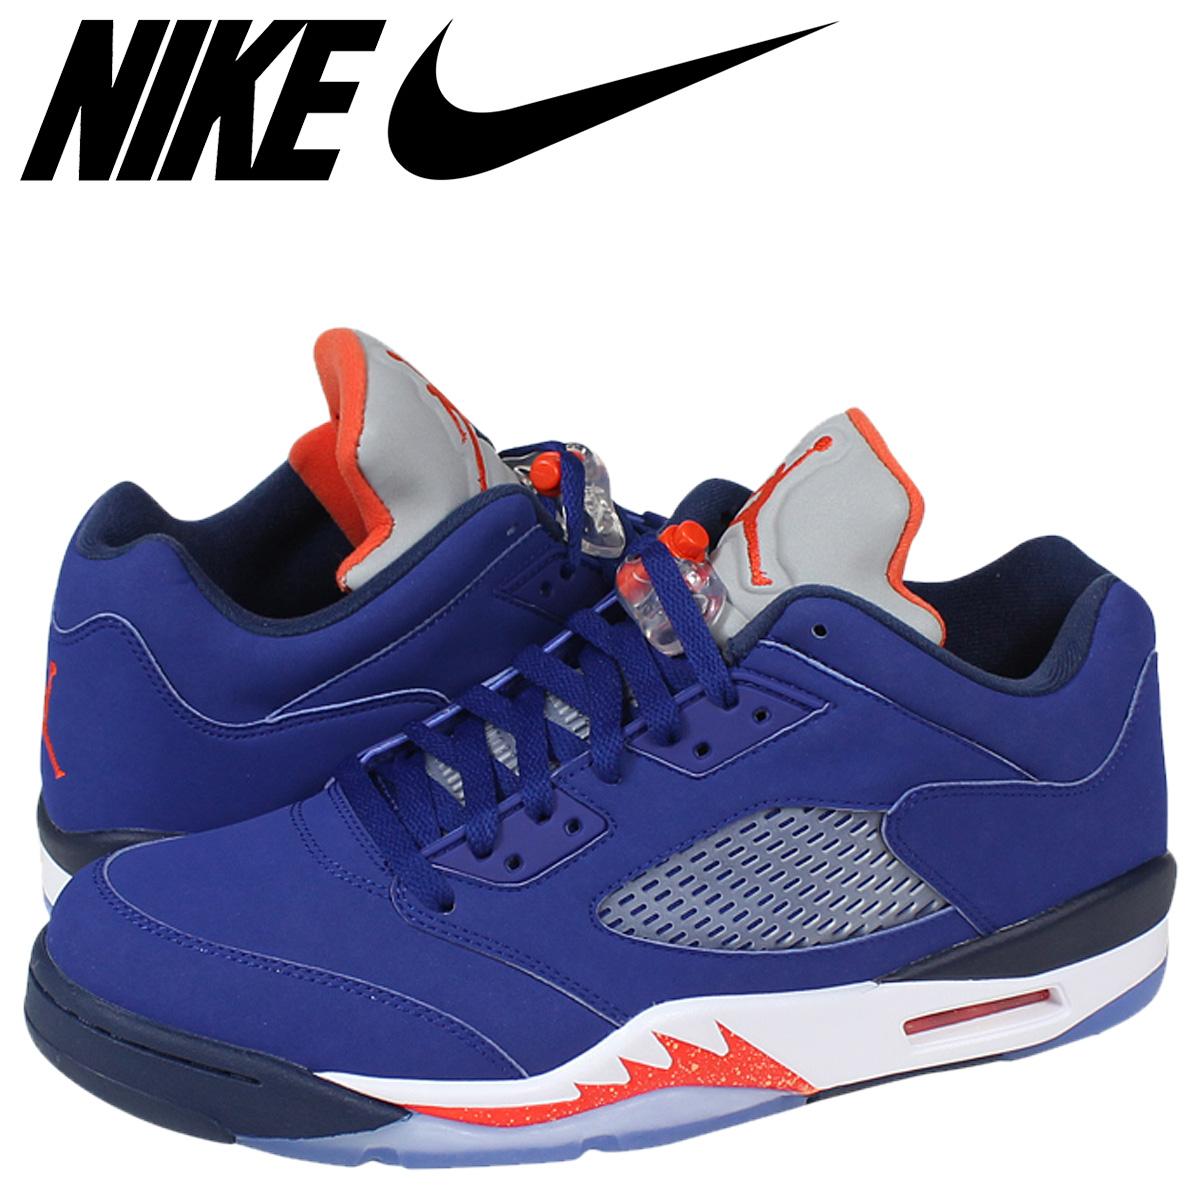 682a98371b3 Nike NIKE Air Jordan sneakers AIR JORDAN 5 RETRO LOW KNICKS Air Jordan 5  nostalgic low ...